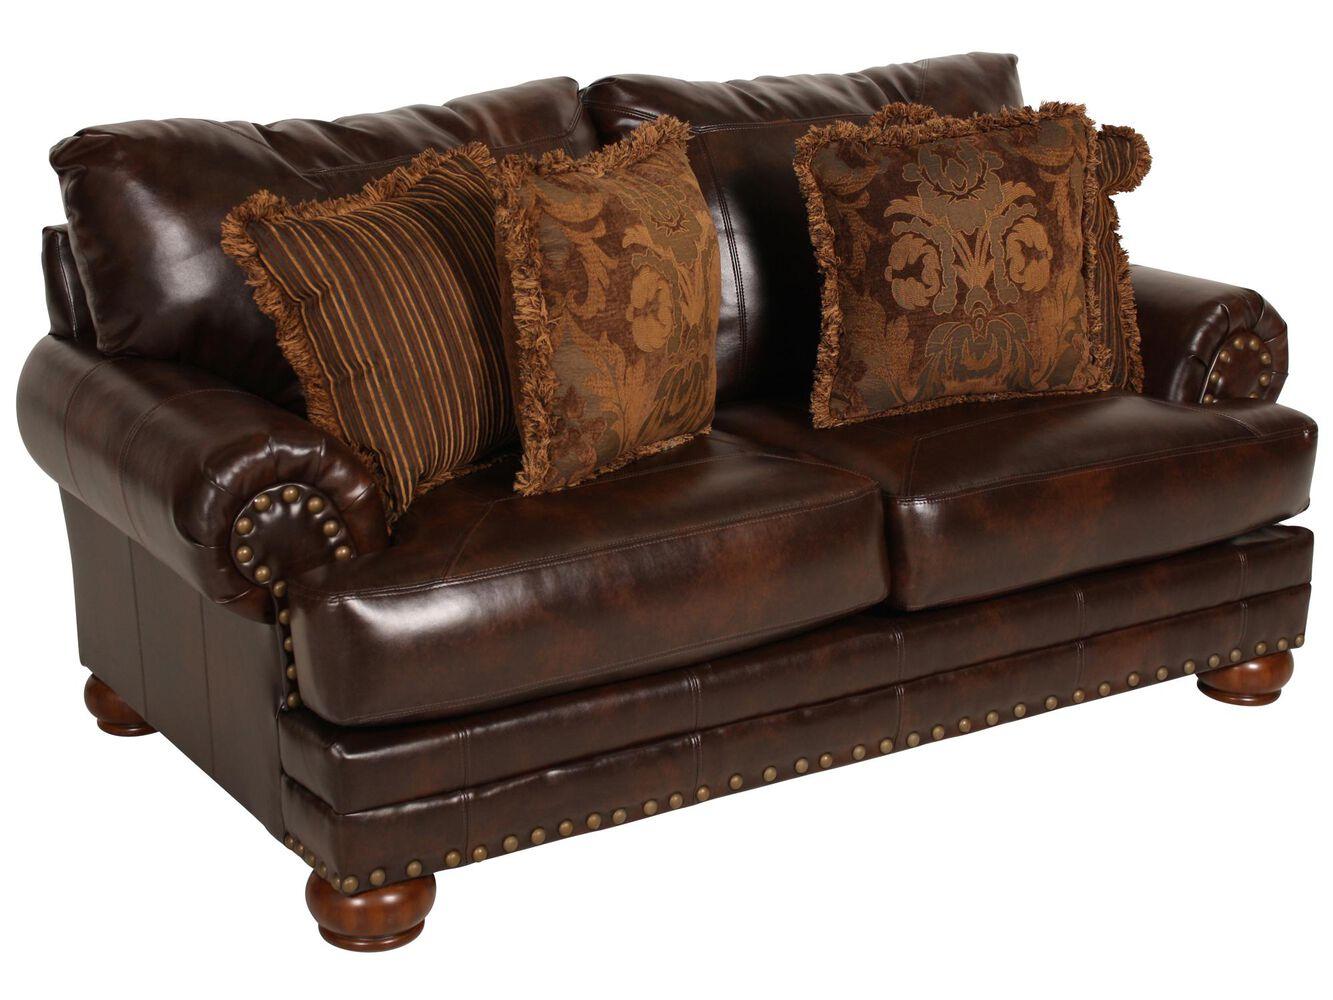 Ashley millennium performance leather antique loveseat - Ashley millennium living room furniture ...